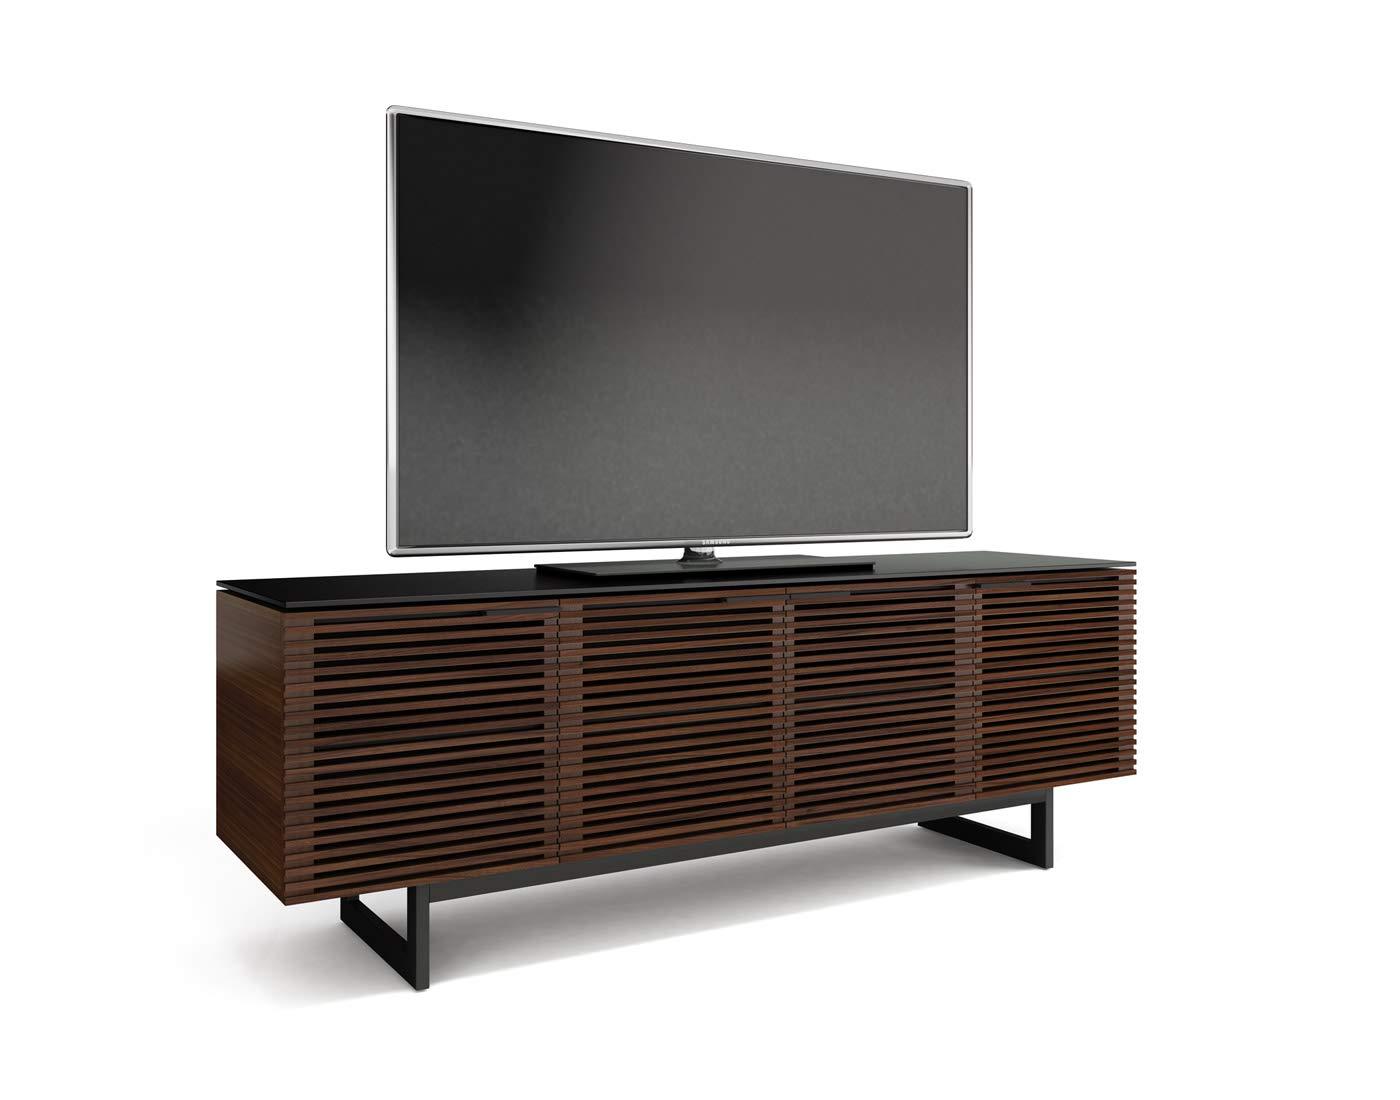 BDI Corridor Quad TV Stand Media Cabinet, Chocolate Stained Walnut